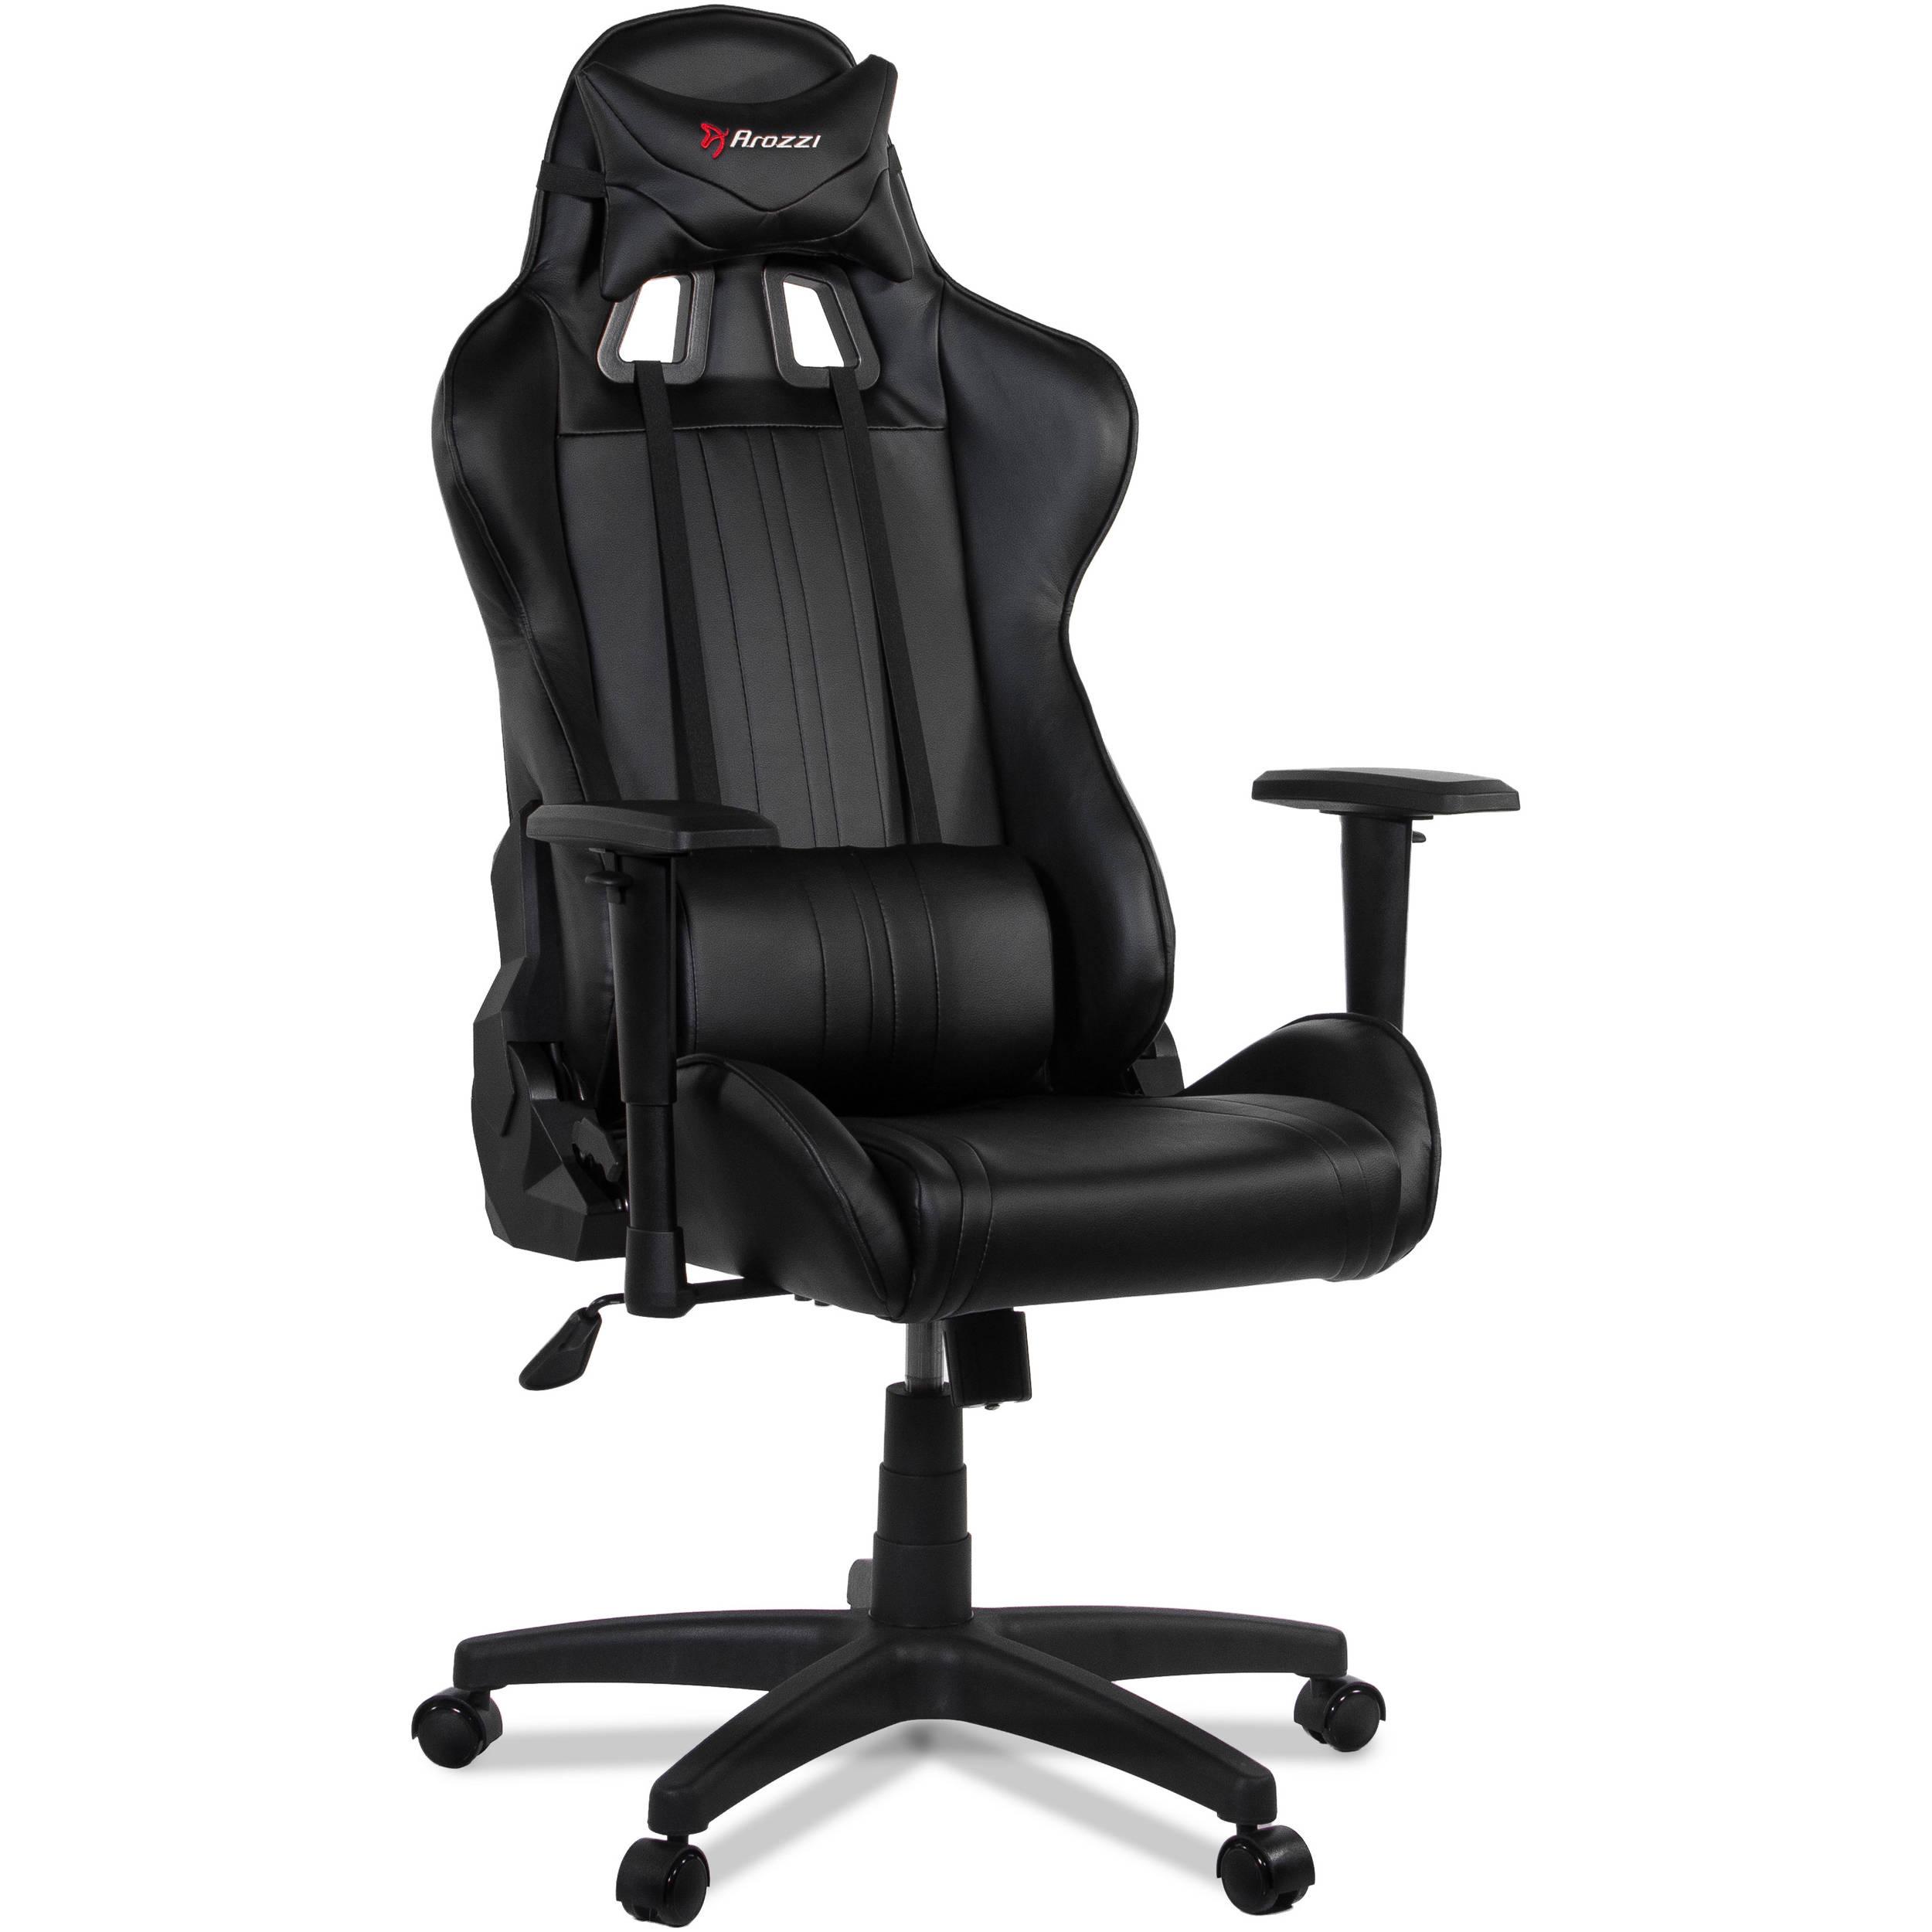 Arozzi Mezzo Gaming Chair Black MEZZO BK B&H Video